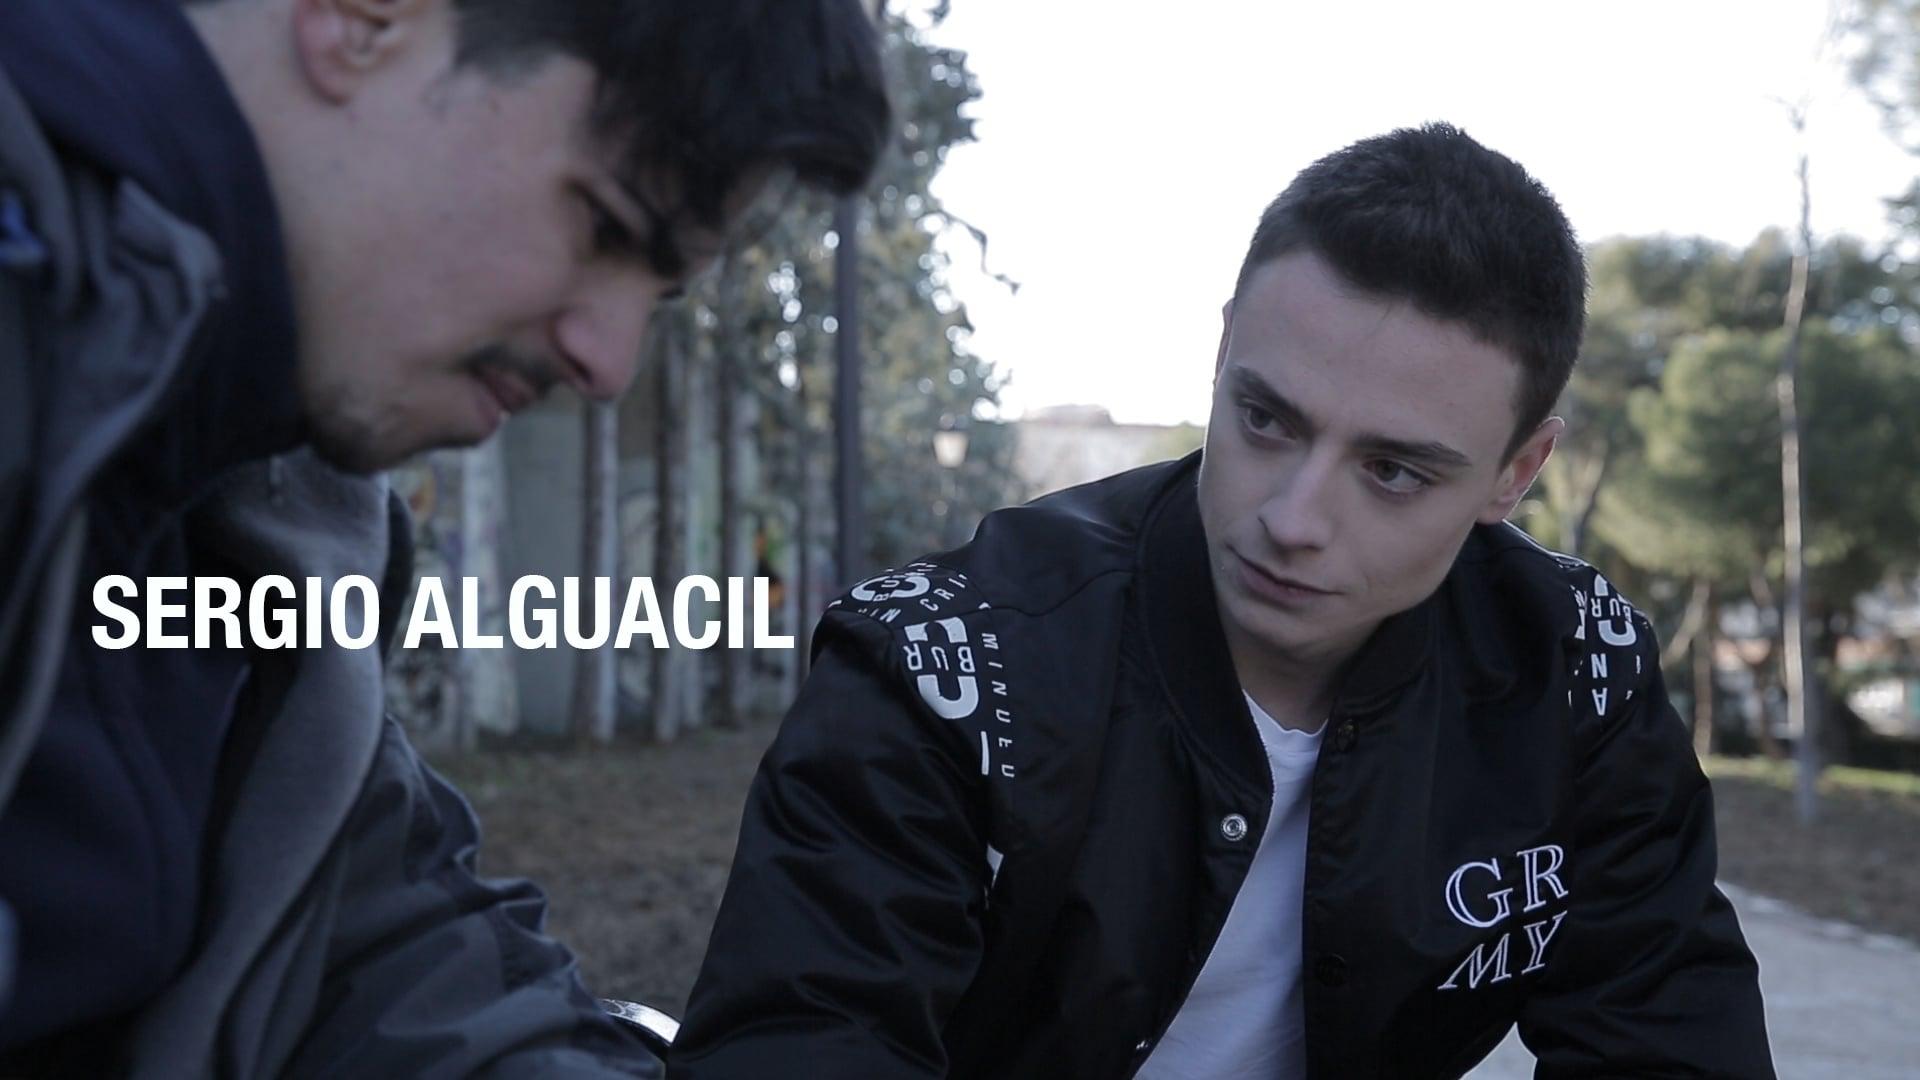 Sergio Alguacil Videobook